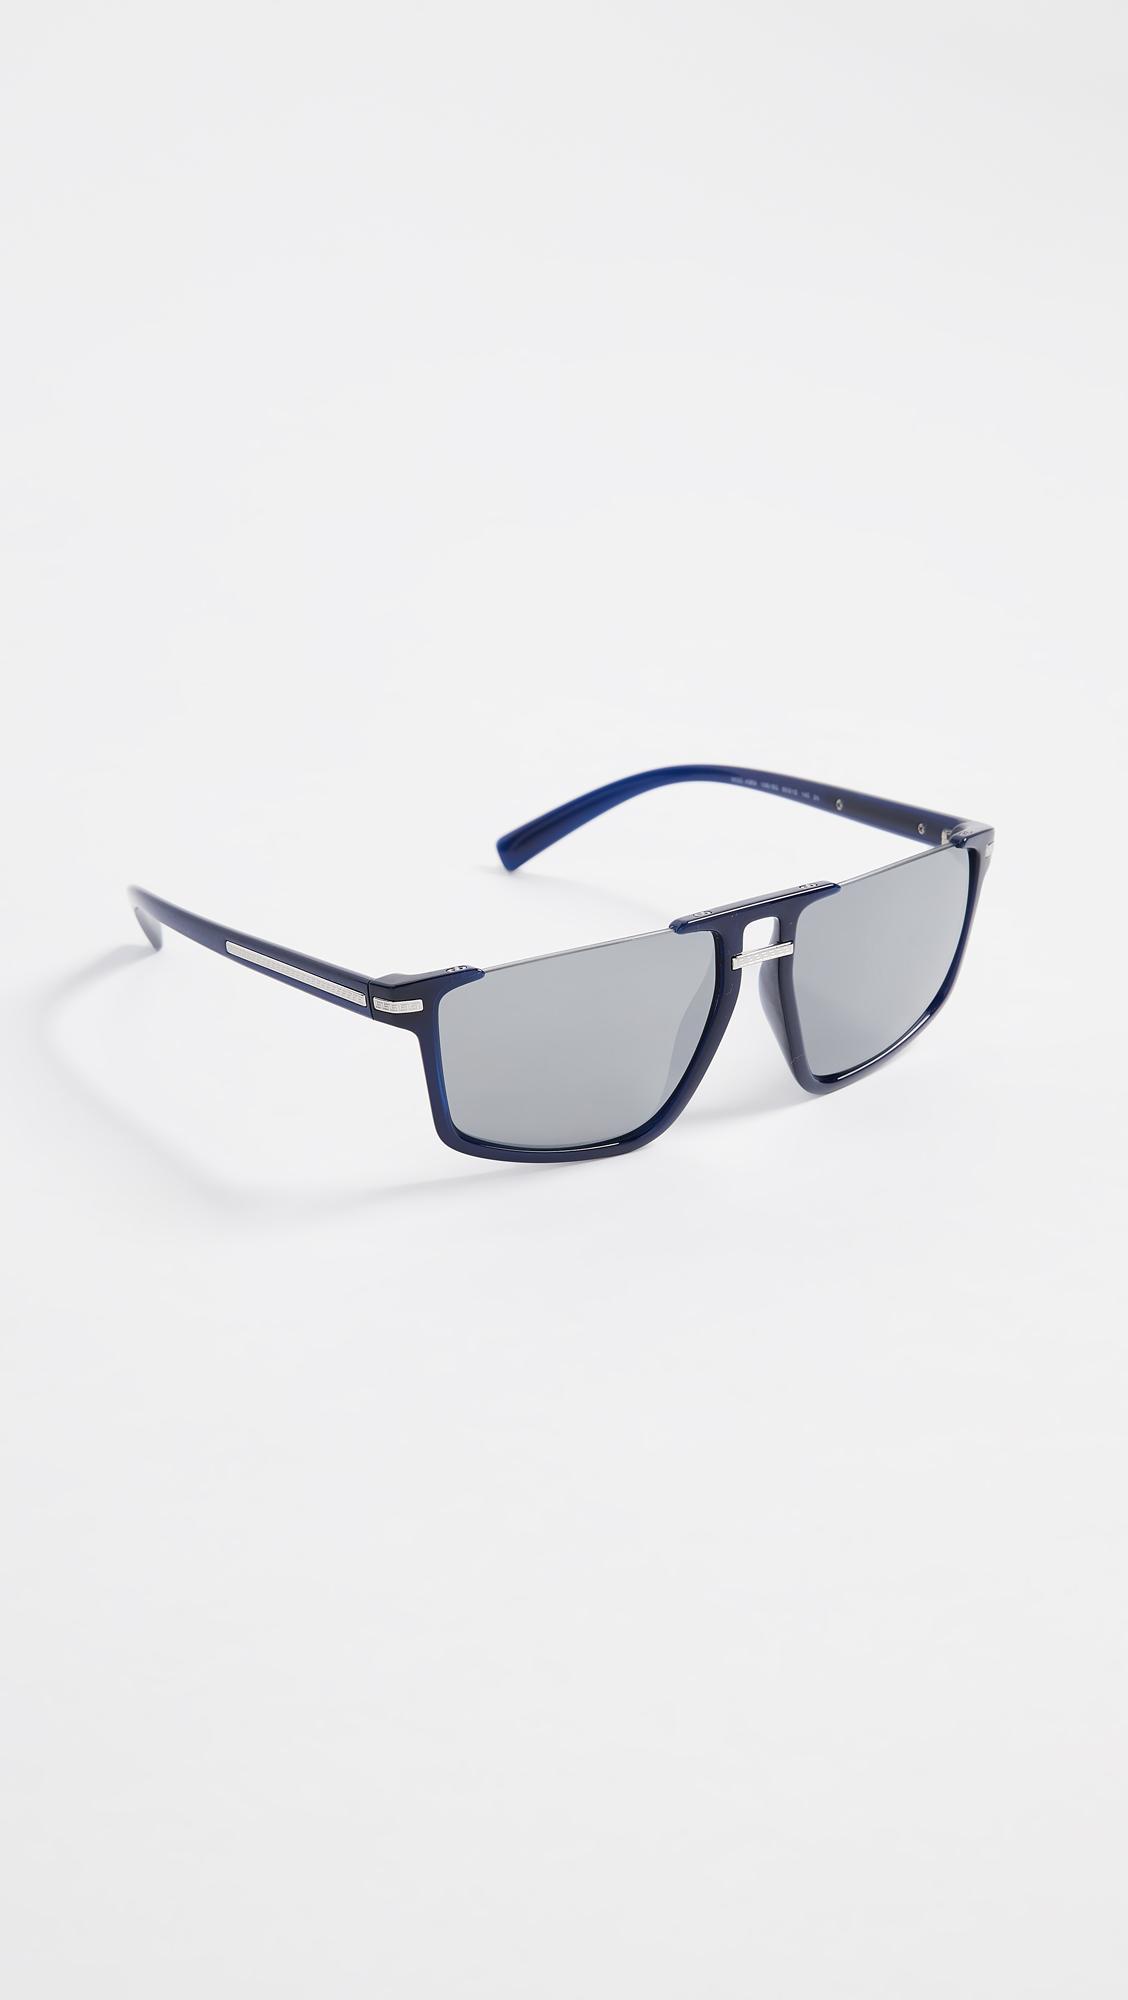 de3a8fa32141 Lyst - Versace Ve4363 Rimless Flat Top Sunglasses in Blue